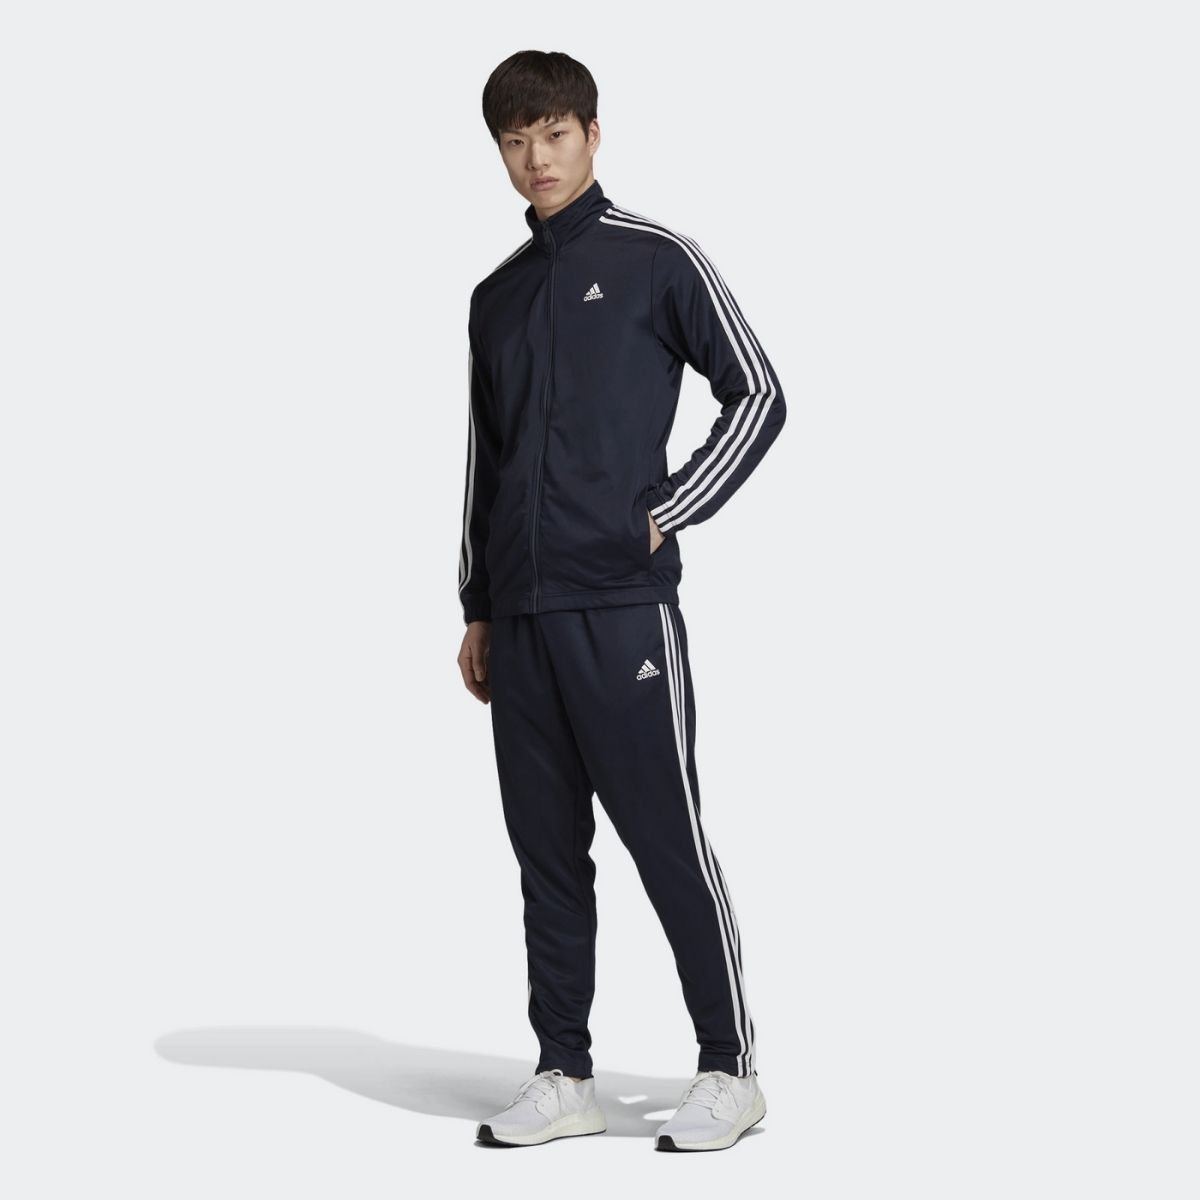 Tuta Adidas Athletics Tiro...